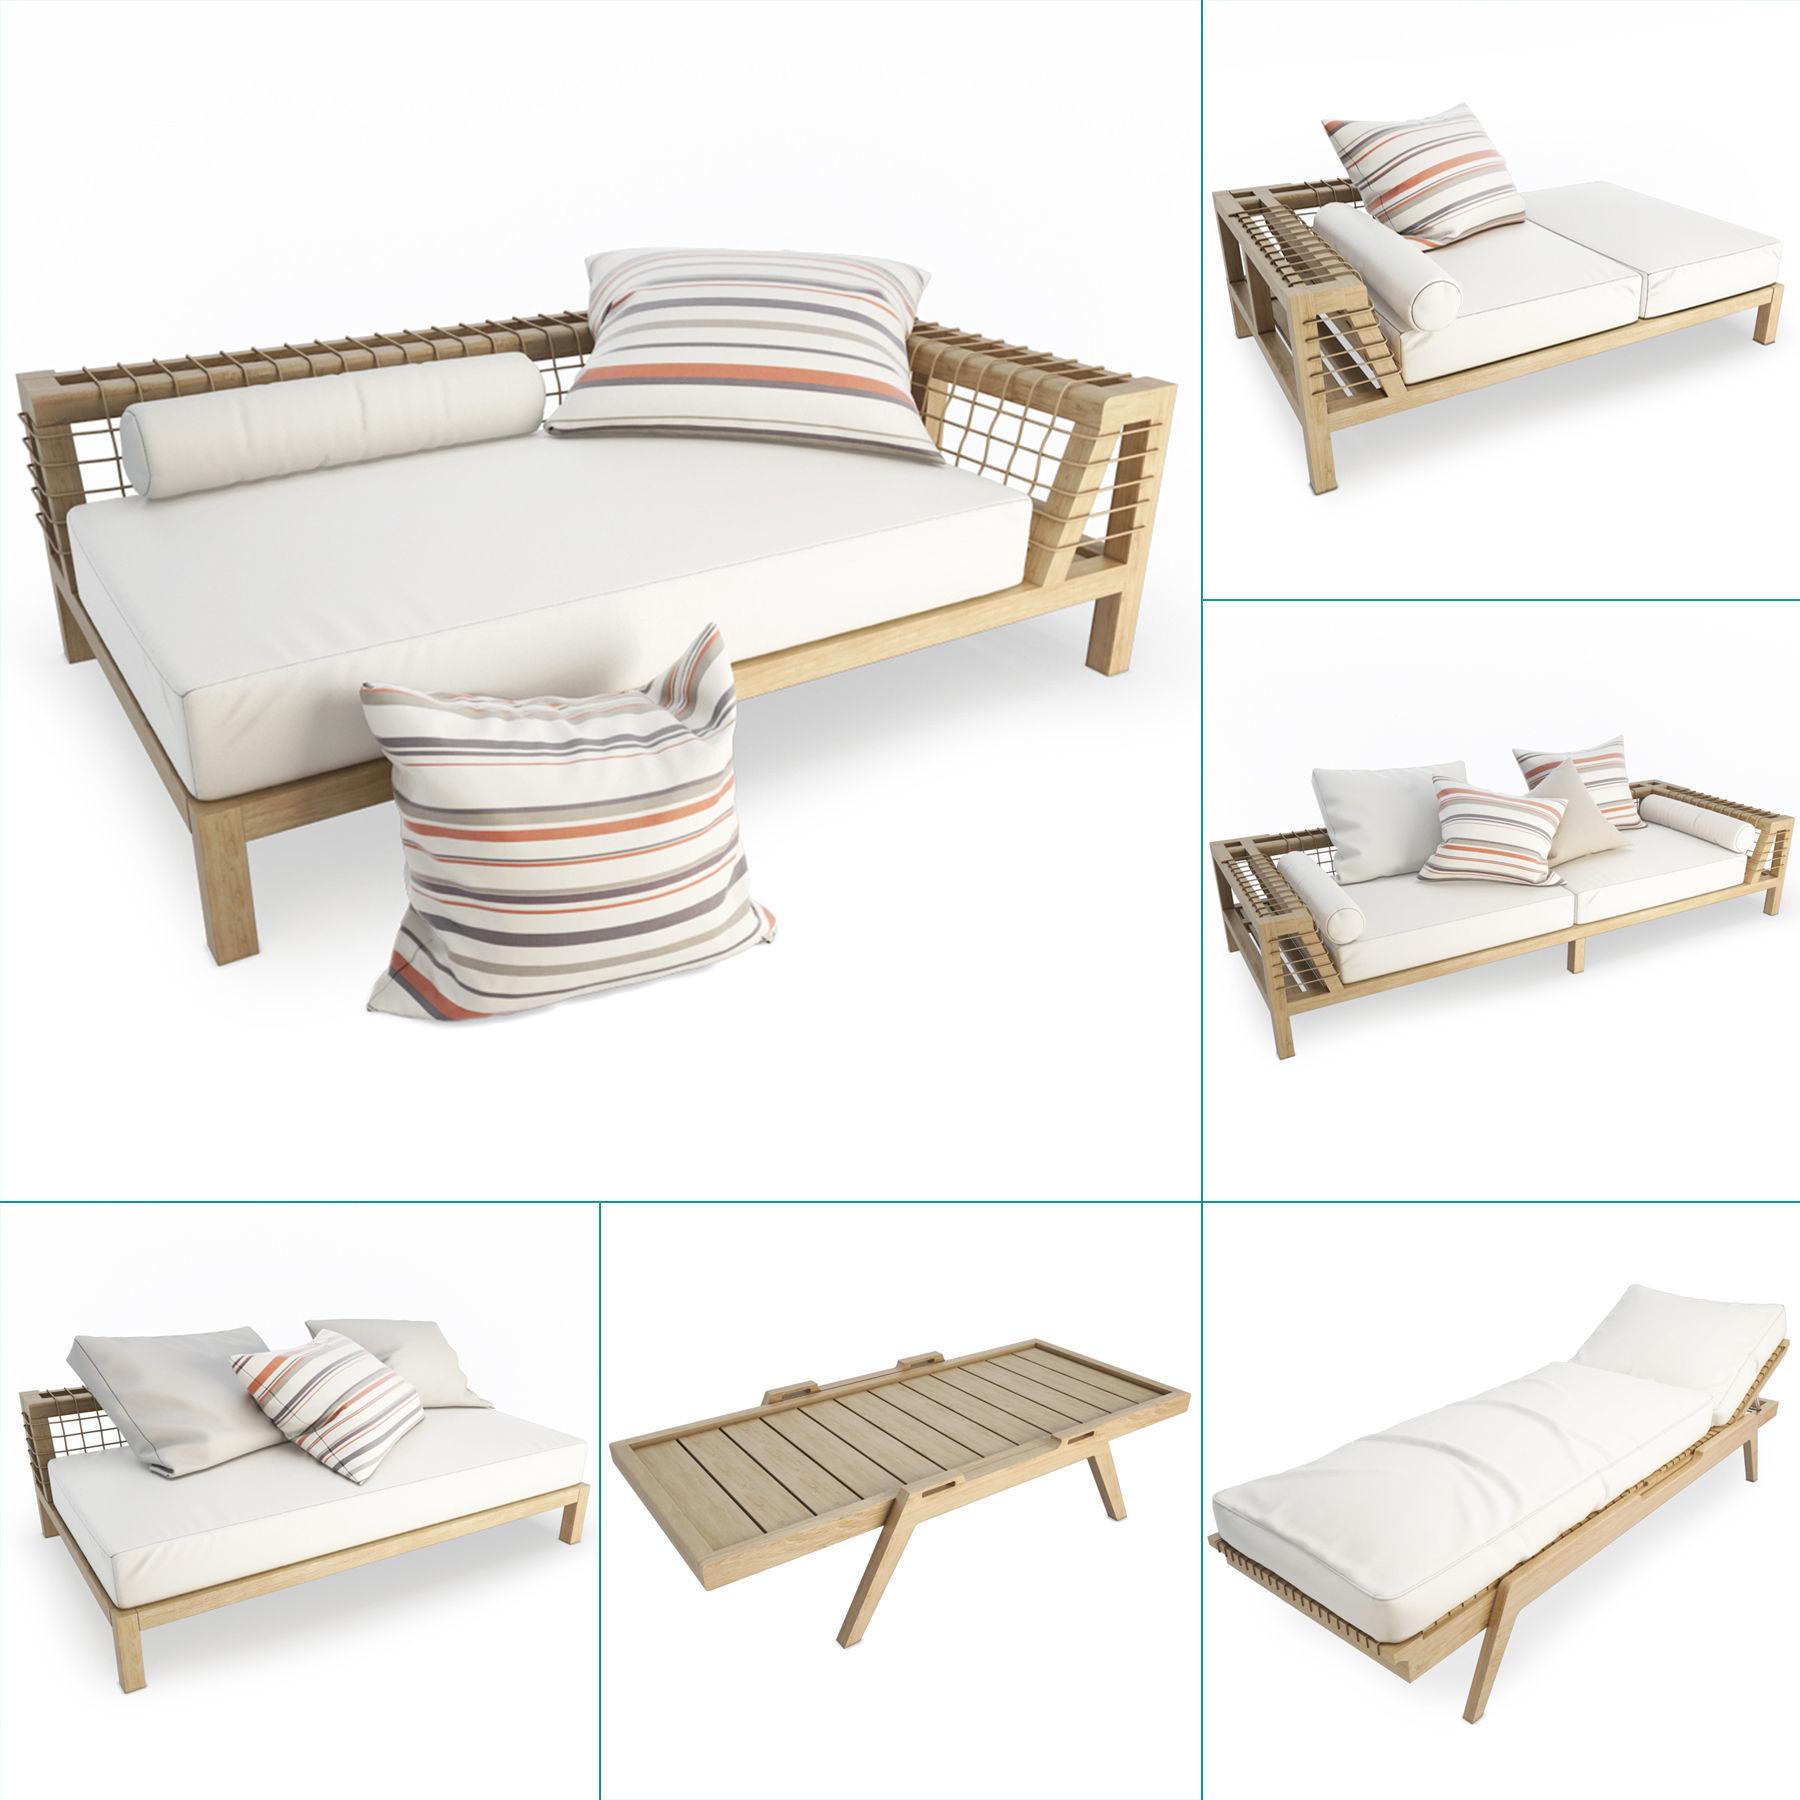 Synthesis Wooden Outdoor Furniture Unopiu